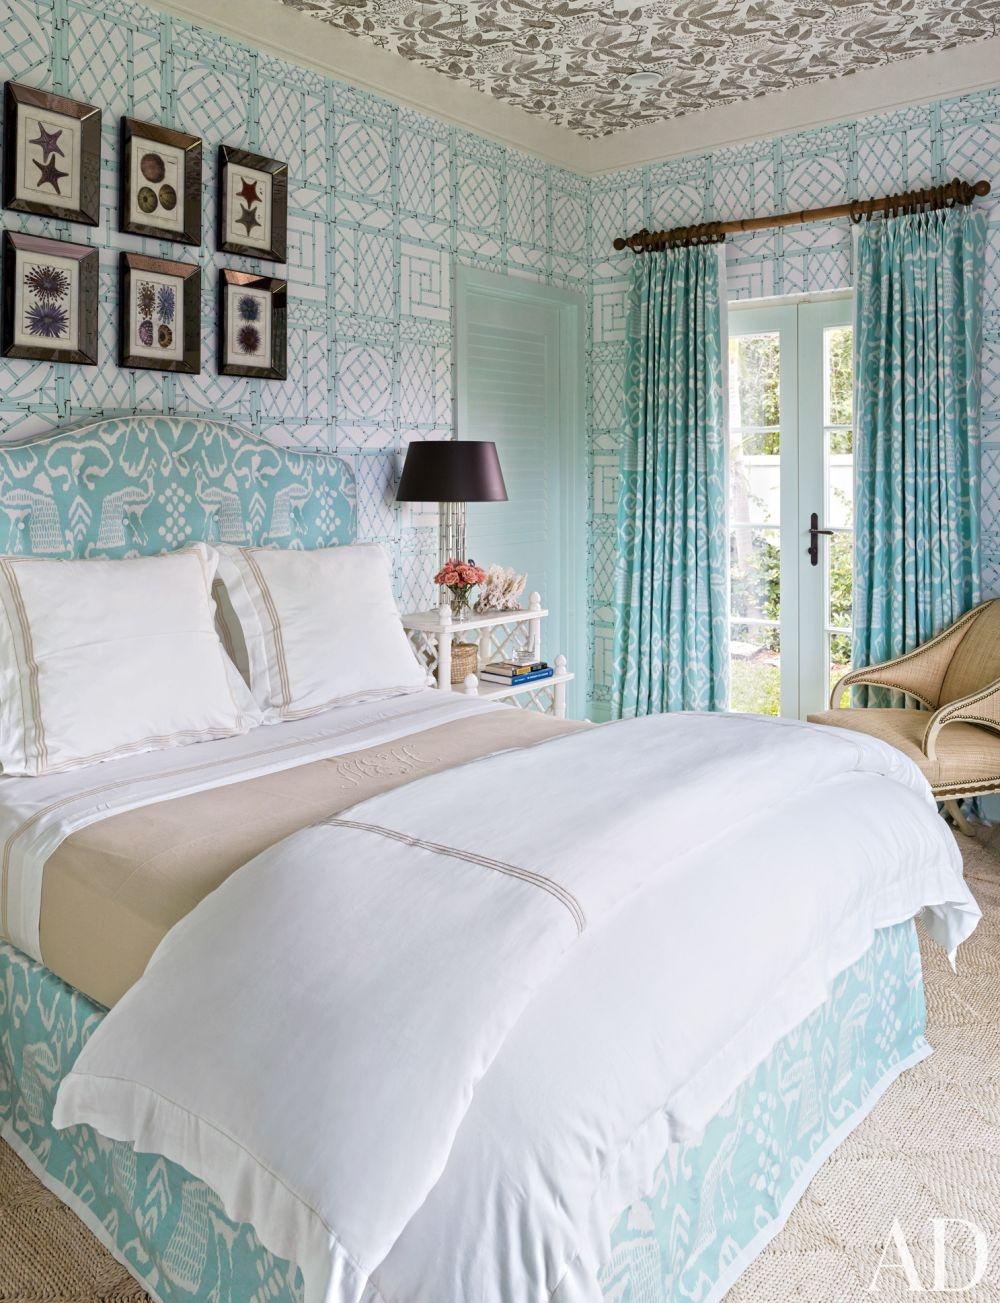 Wondrous Images Beach Inspired Decor Pinterest Plain Easy Diy Bedroom Largest Home Design Picture Inspirations Pitcheantrous